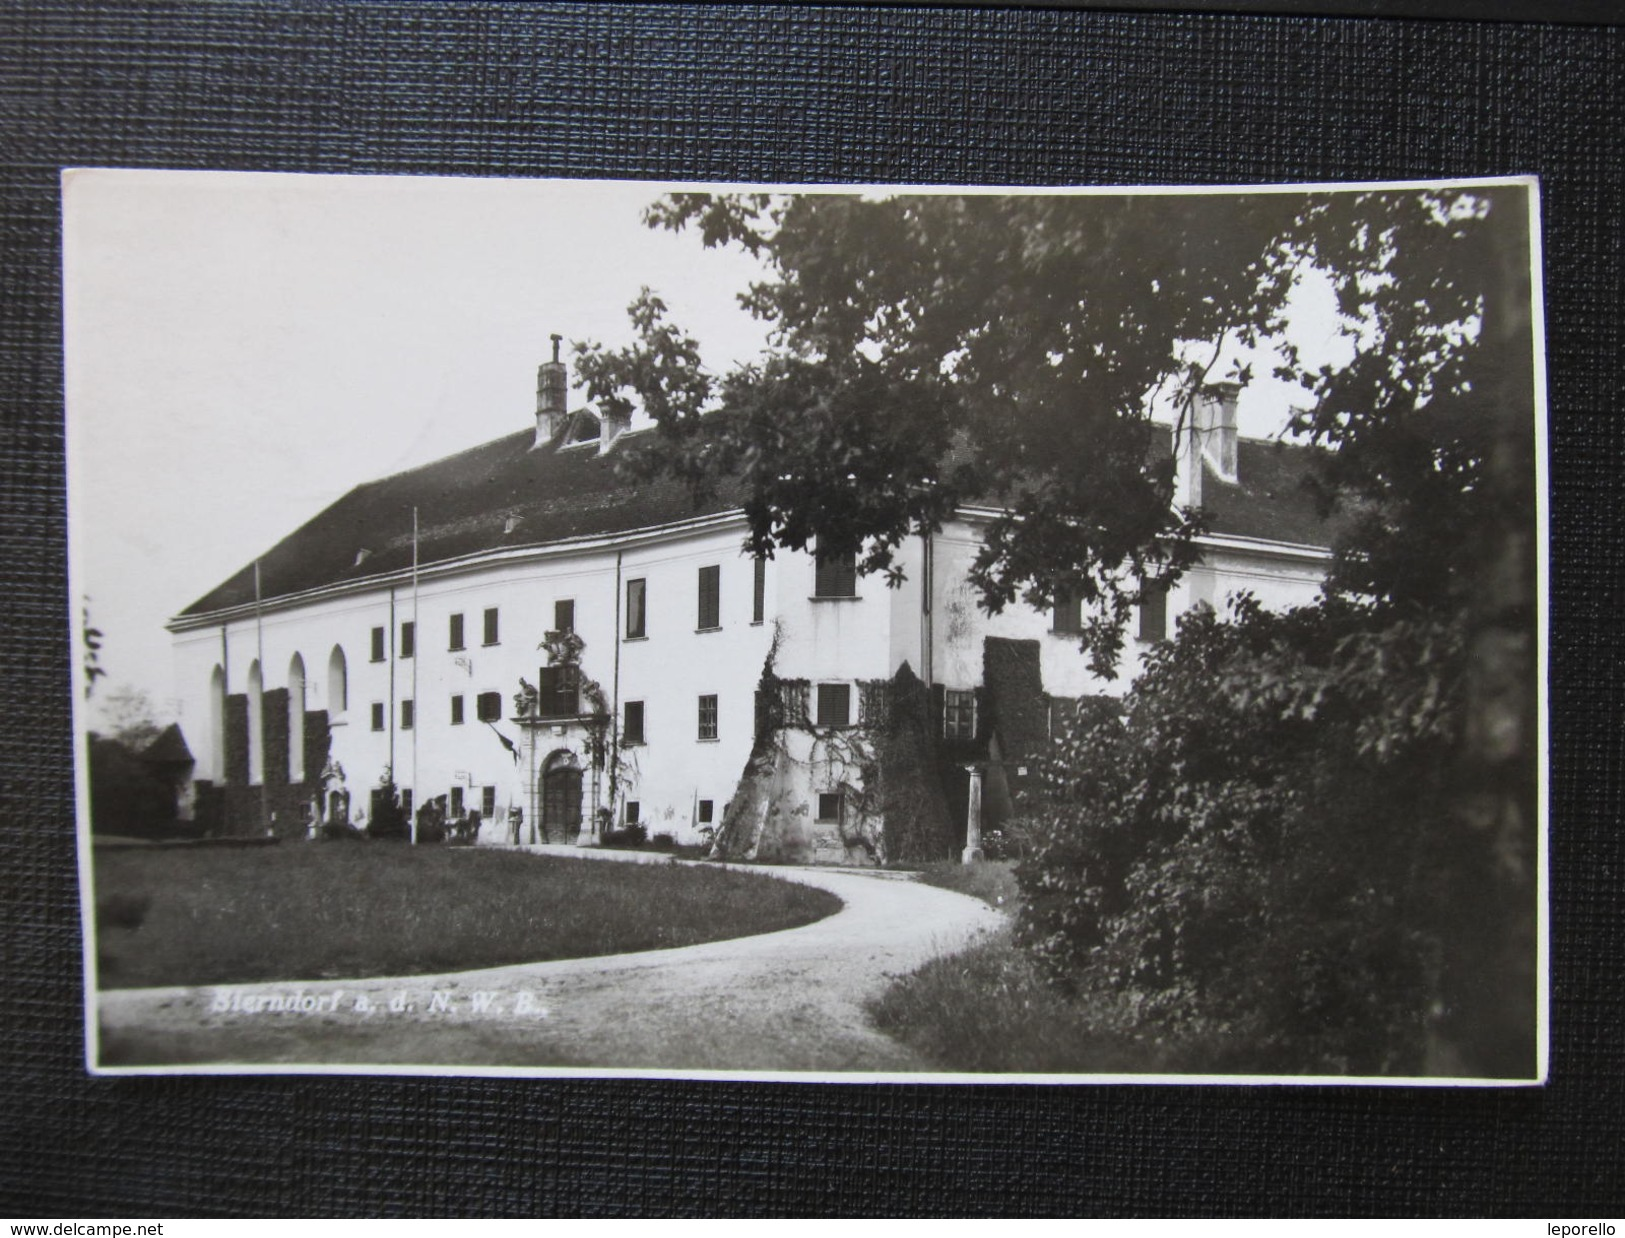 AK SIERNDORF B. Korneuburg 1944 // D*26709 - Korneuburg